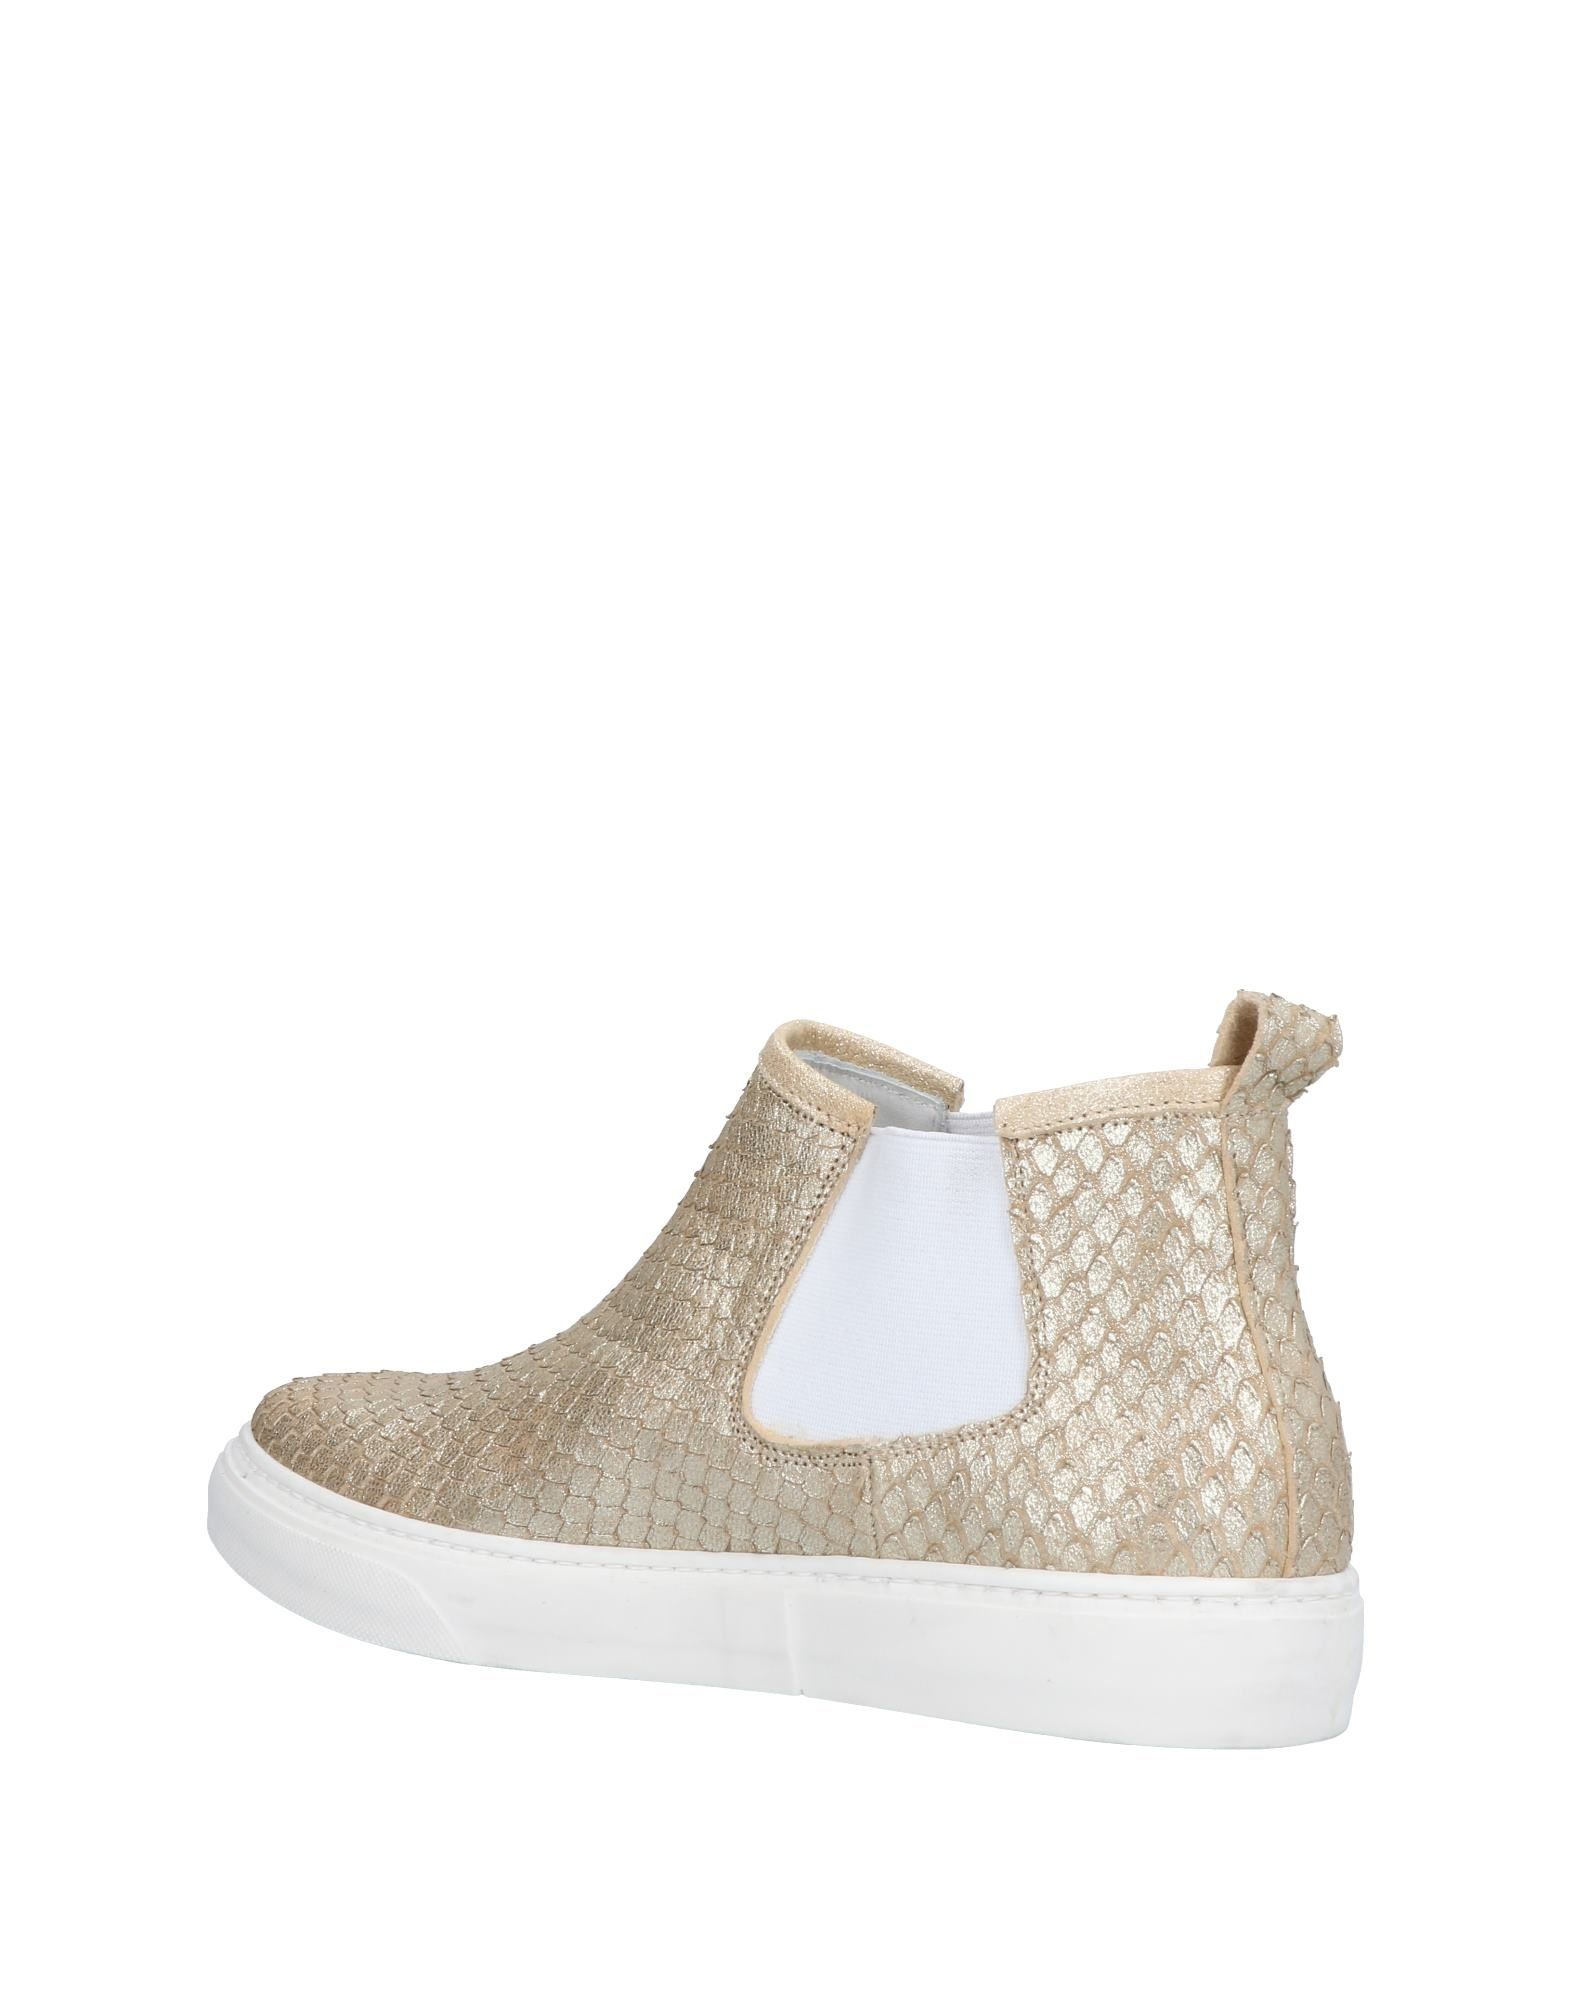 G Basic Sneakers - Women G Basic Basic Basic Sneakers online on  United Kingdom - 11460657IQ 2c1cc1